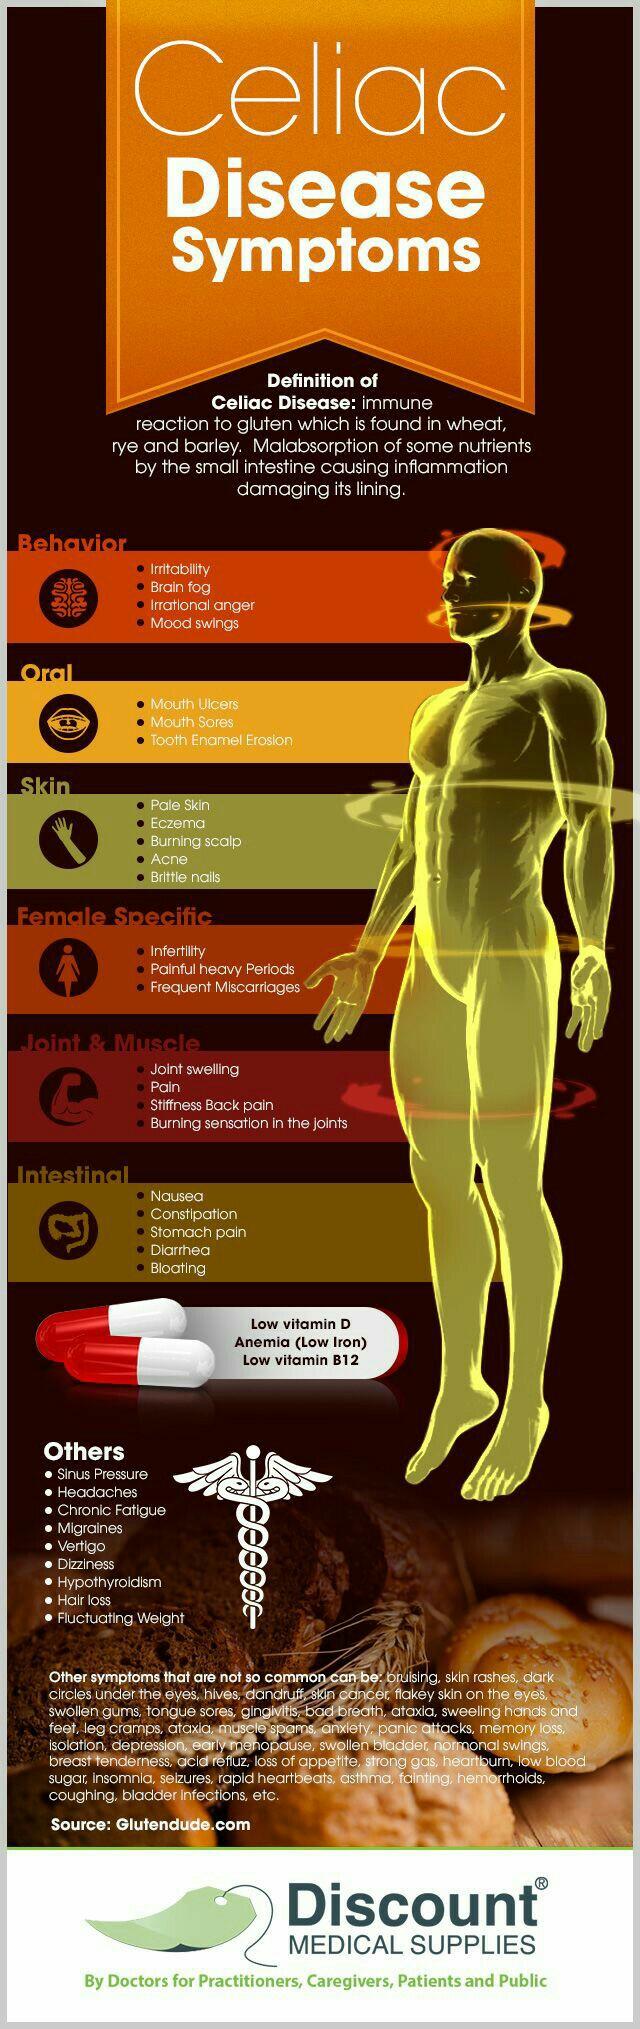 Pin by shahid ehrin on science | Celiac disease symptoms ...